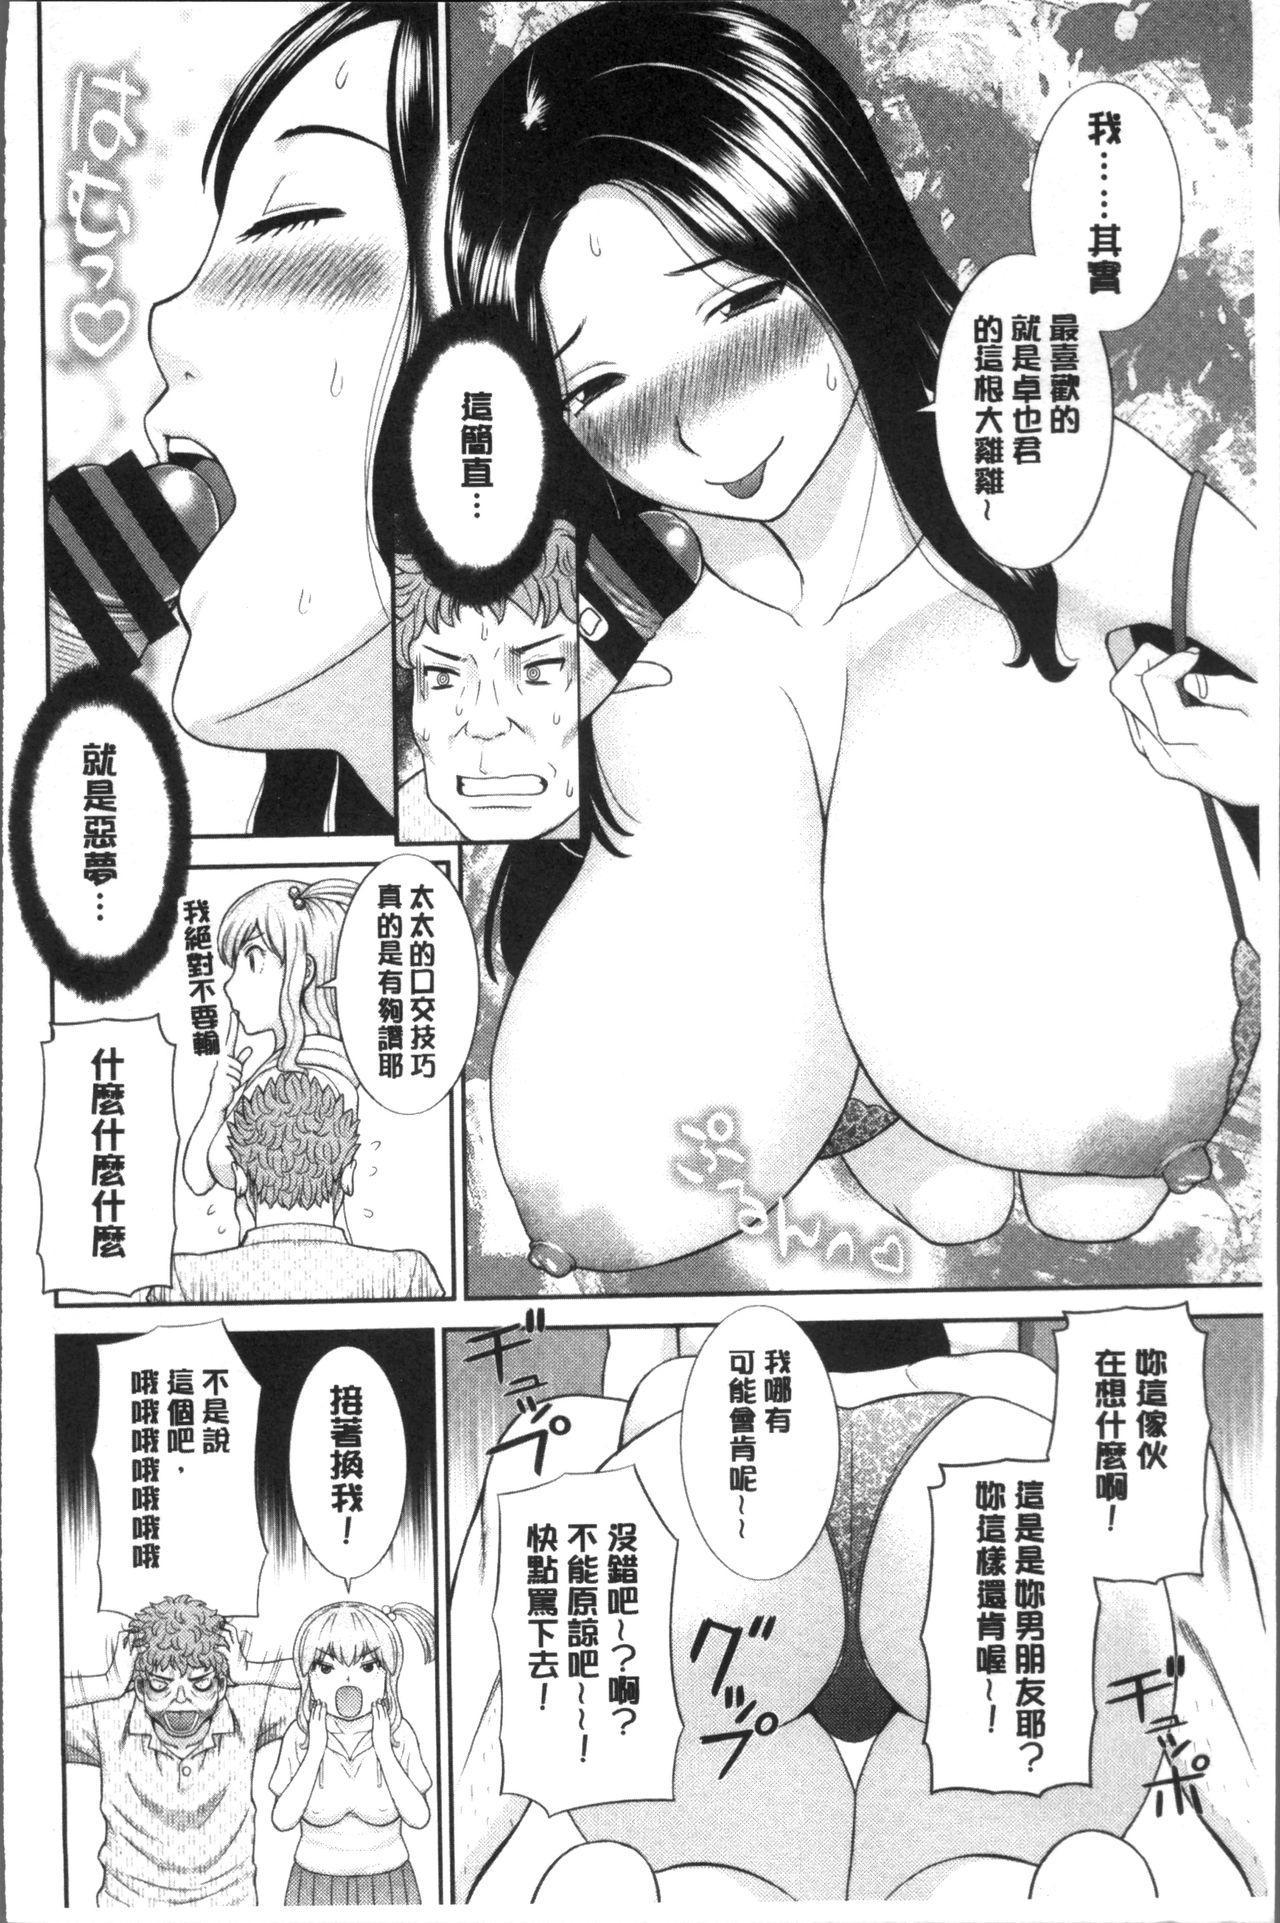 [Kawamori Misaki] Innyuu Shufu no Futei Ganbou - Oku-san to Kanojo to 2 | 淫乳主婦的不貞願望 和人妻也和女友❤2 [Chinese] 139